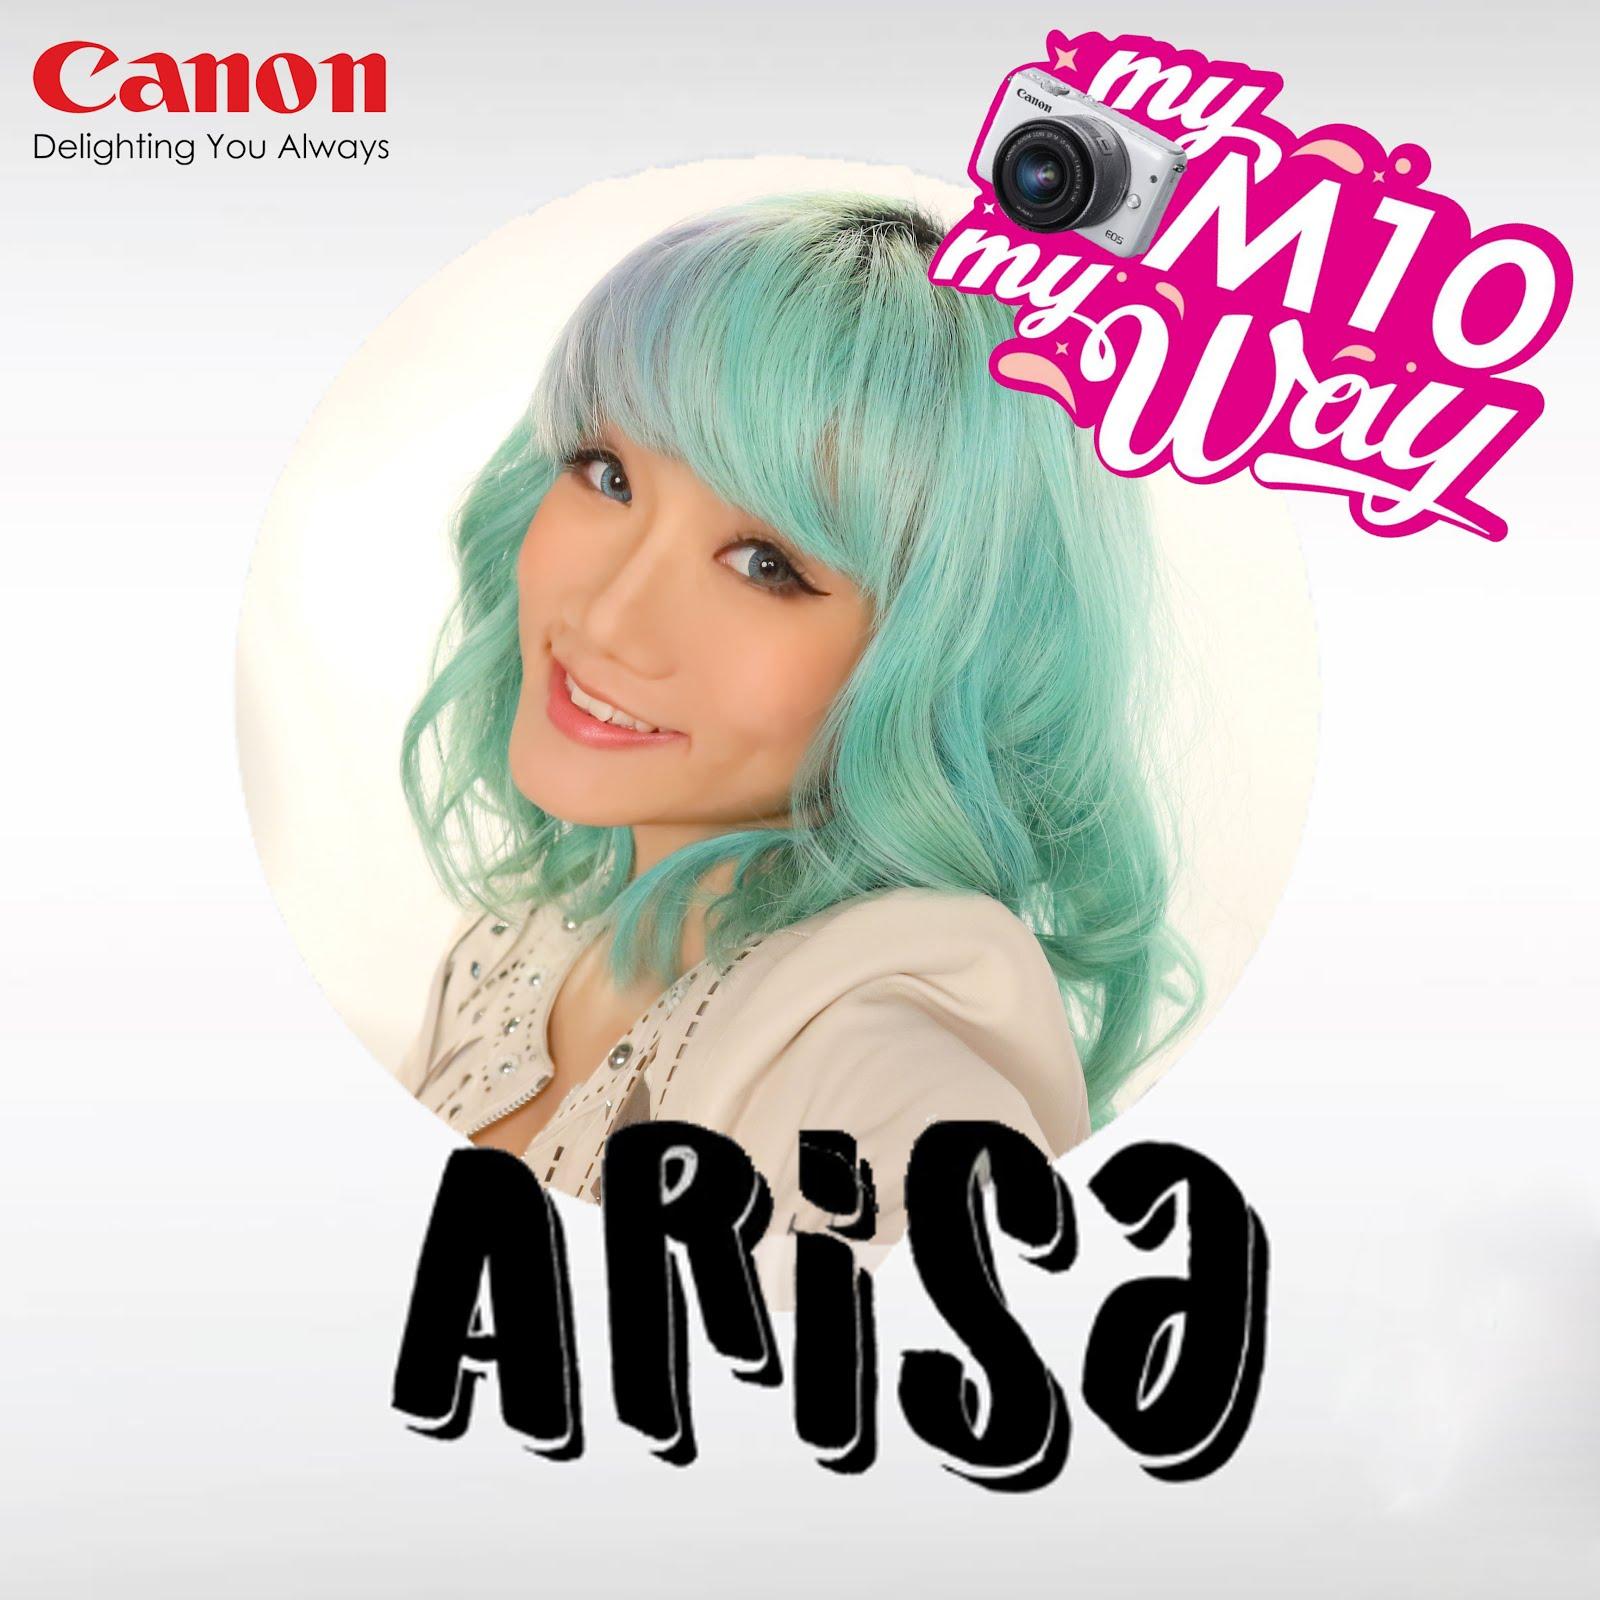 Canon EOSM10 Ambassador